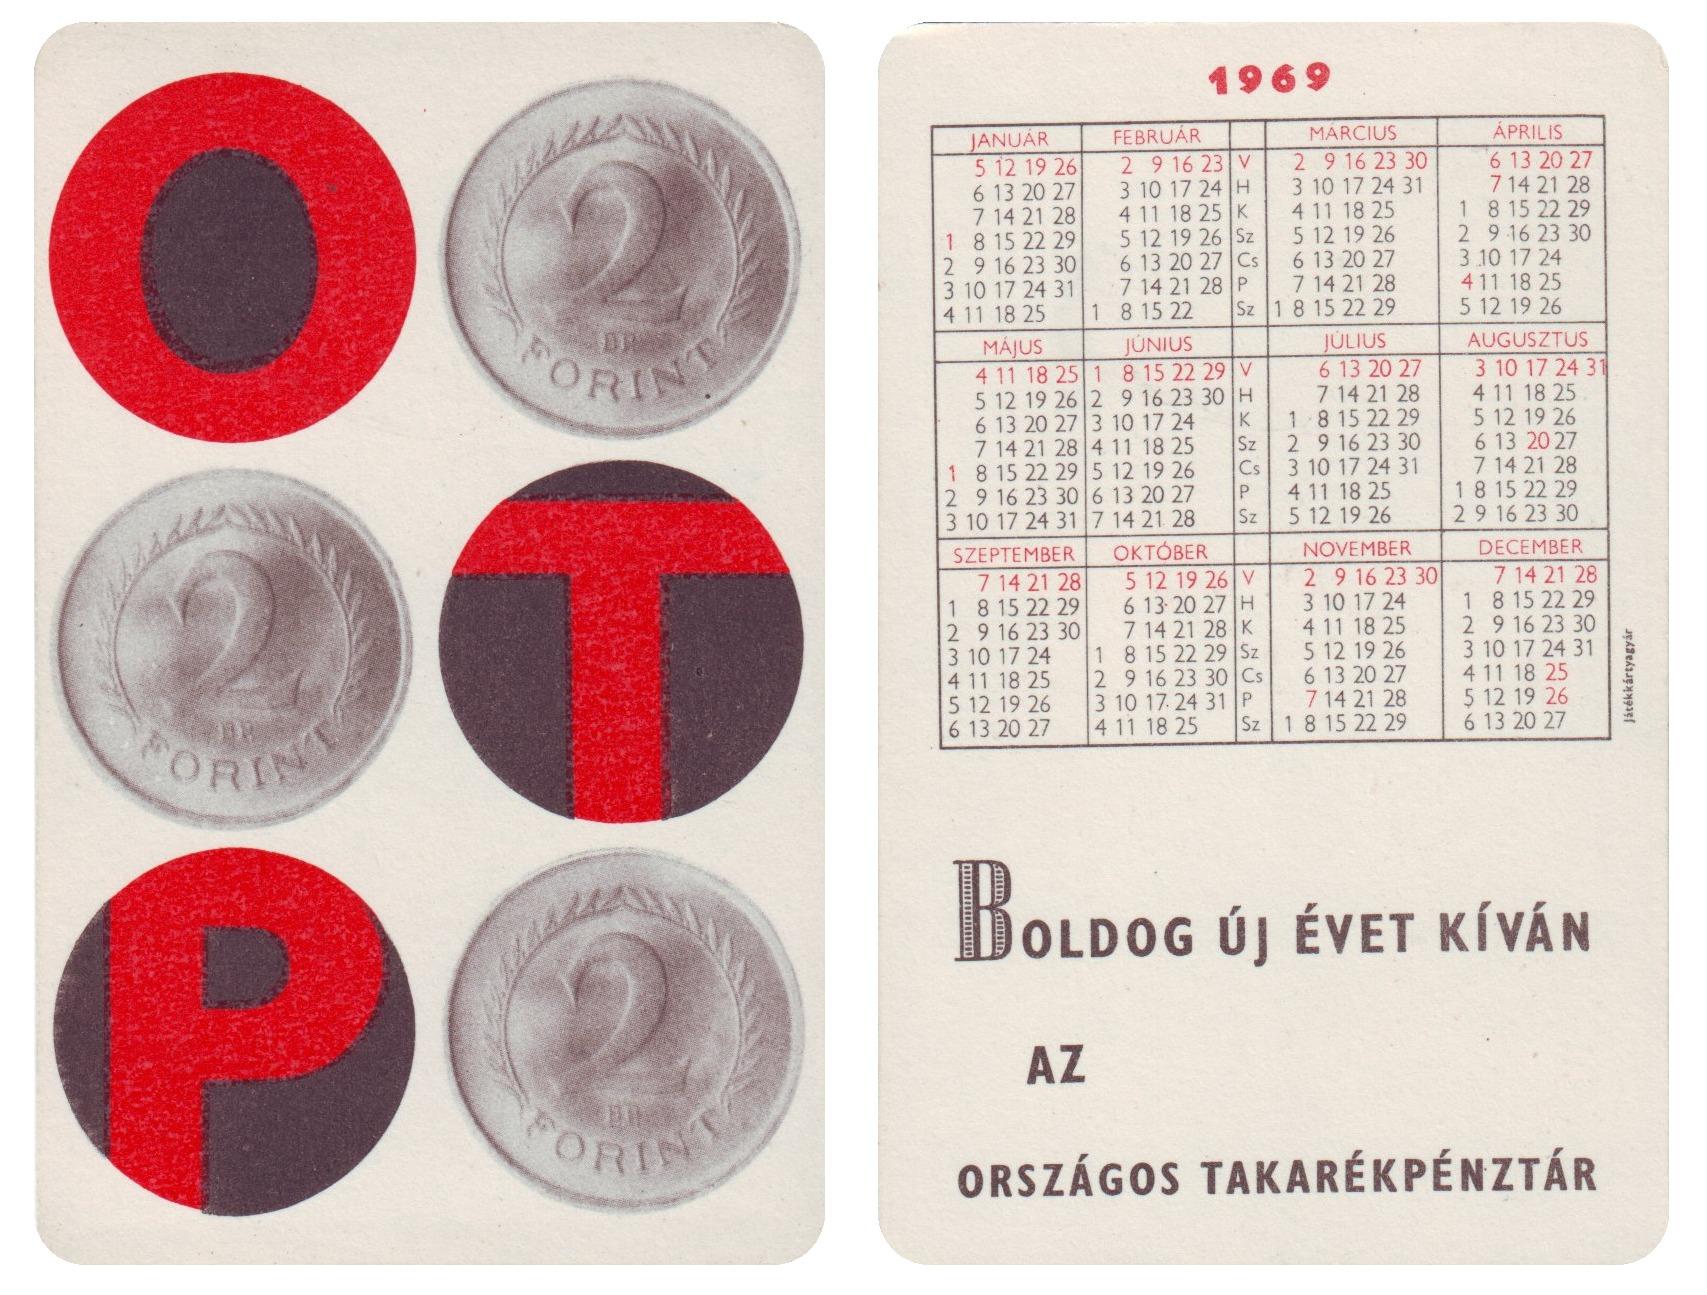 http://www.forintportal.hu/kartyanaptar/www_forintportal_hu_1969_kartyanaptar_005_nagy.jpg